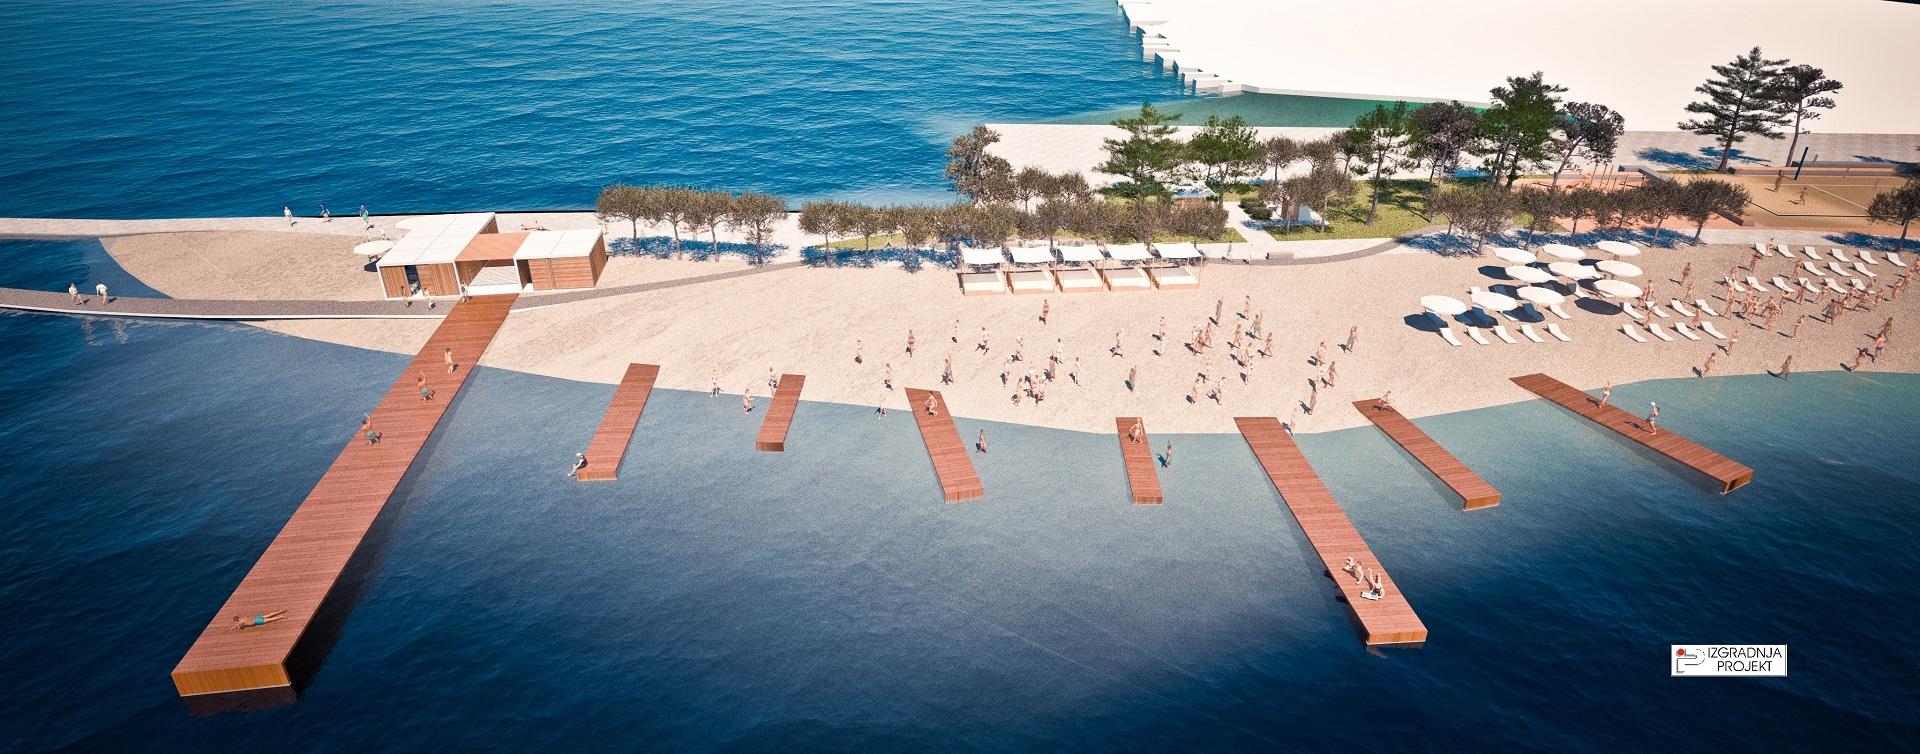 Brodarica beach makeover (photo: izgradnja projekt)